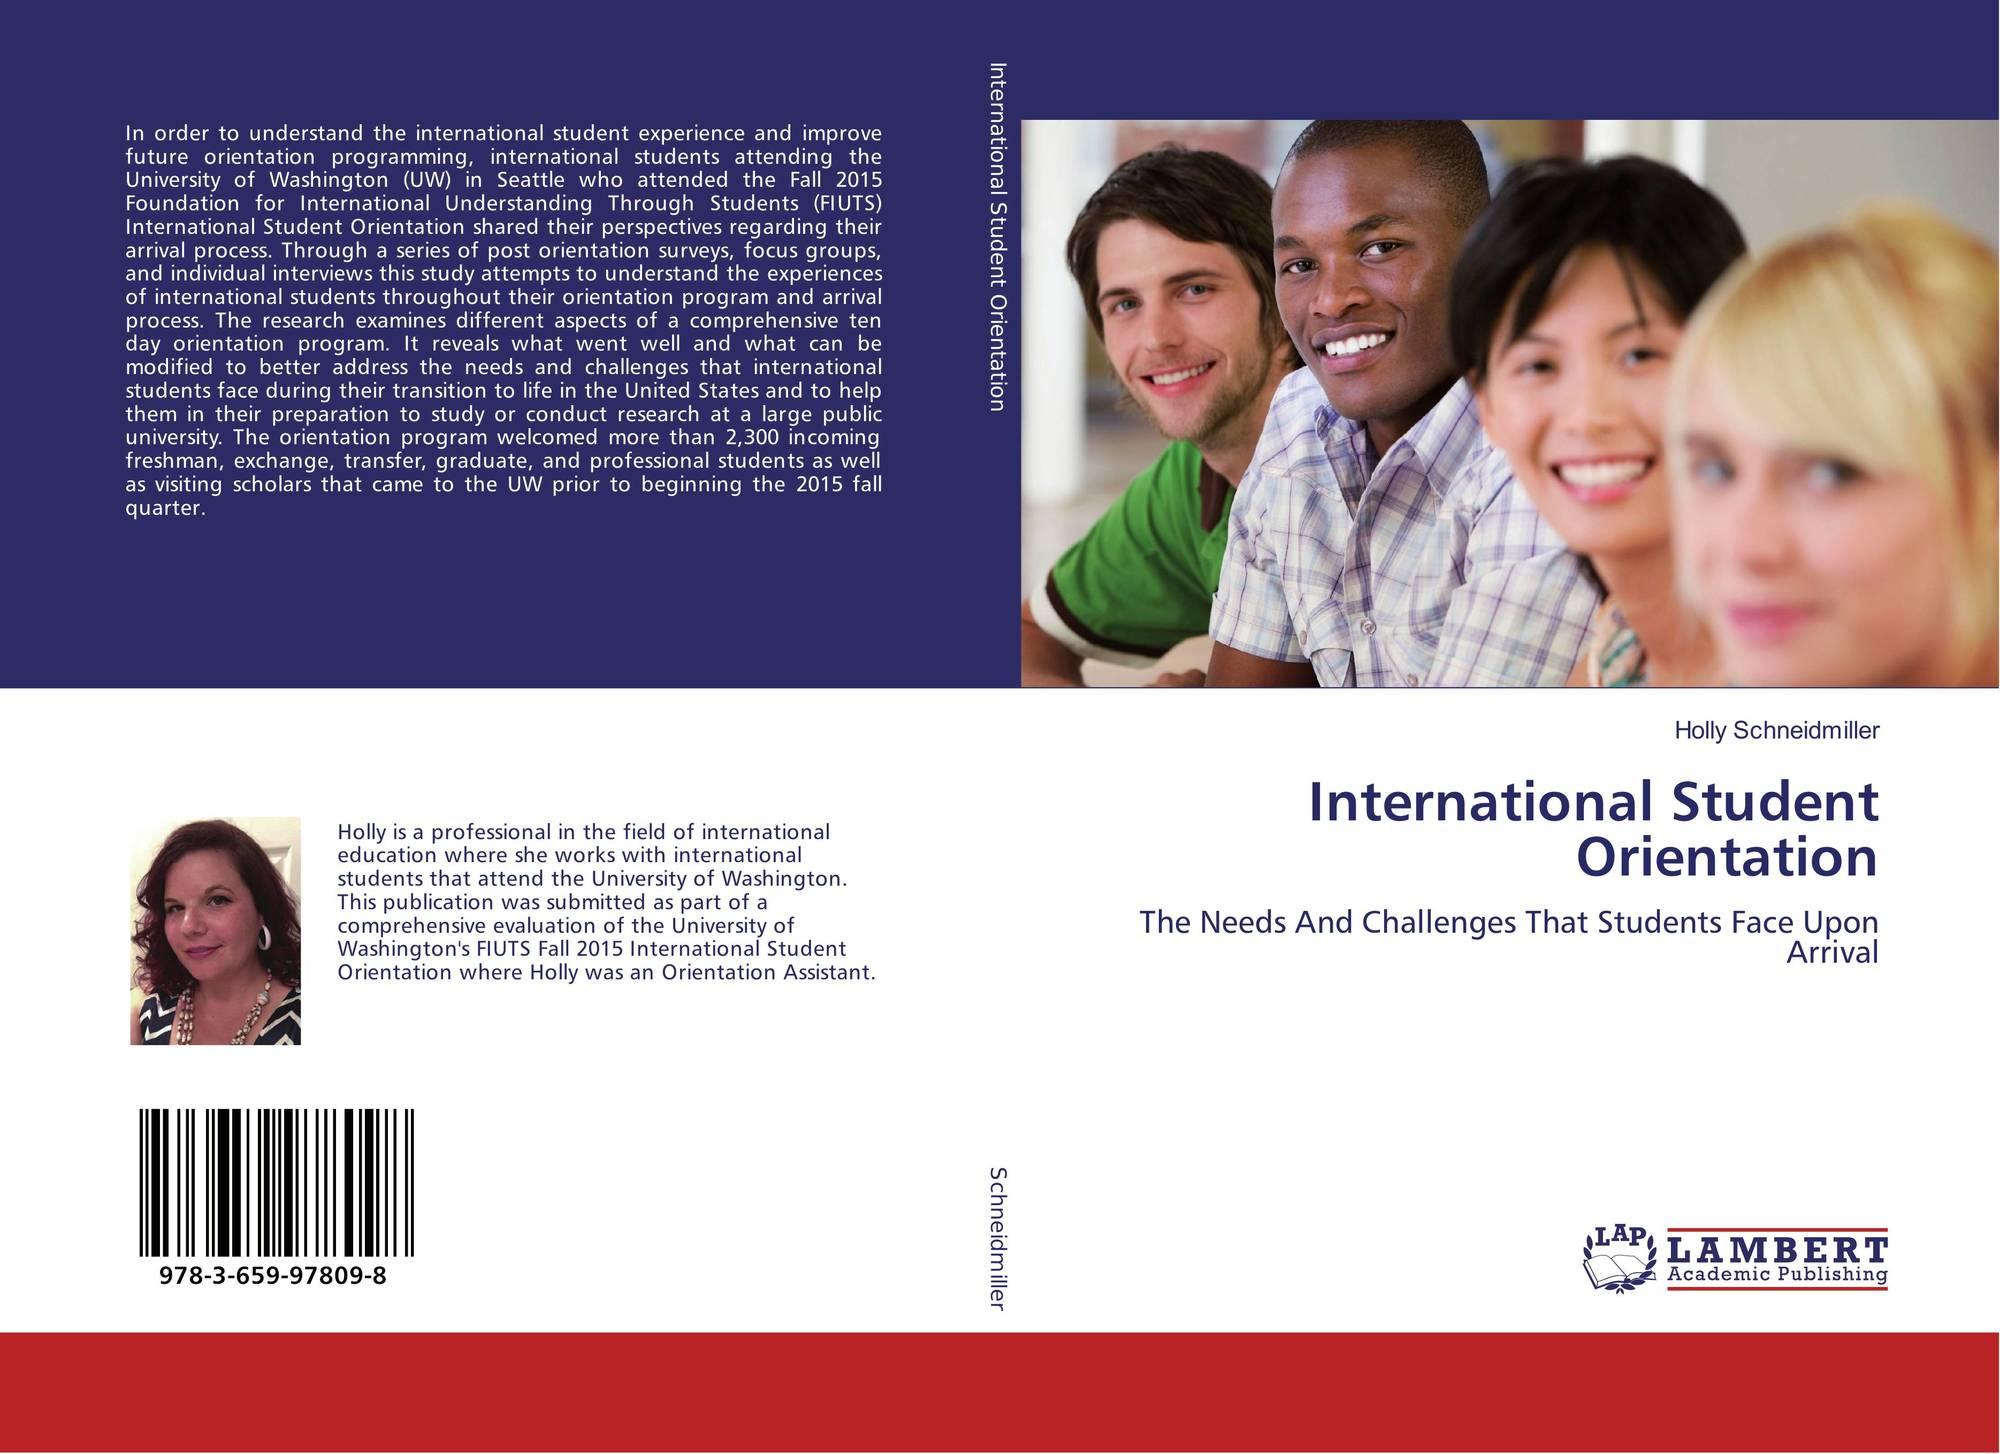 International Student Orientation / 978-3-659-97809-8 / 9783659978098 / 3659978094